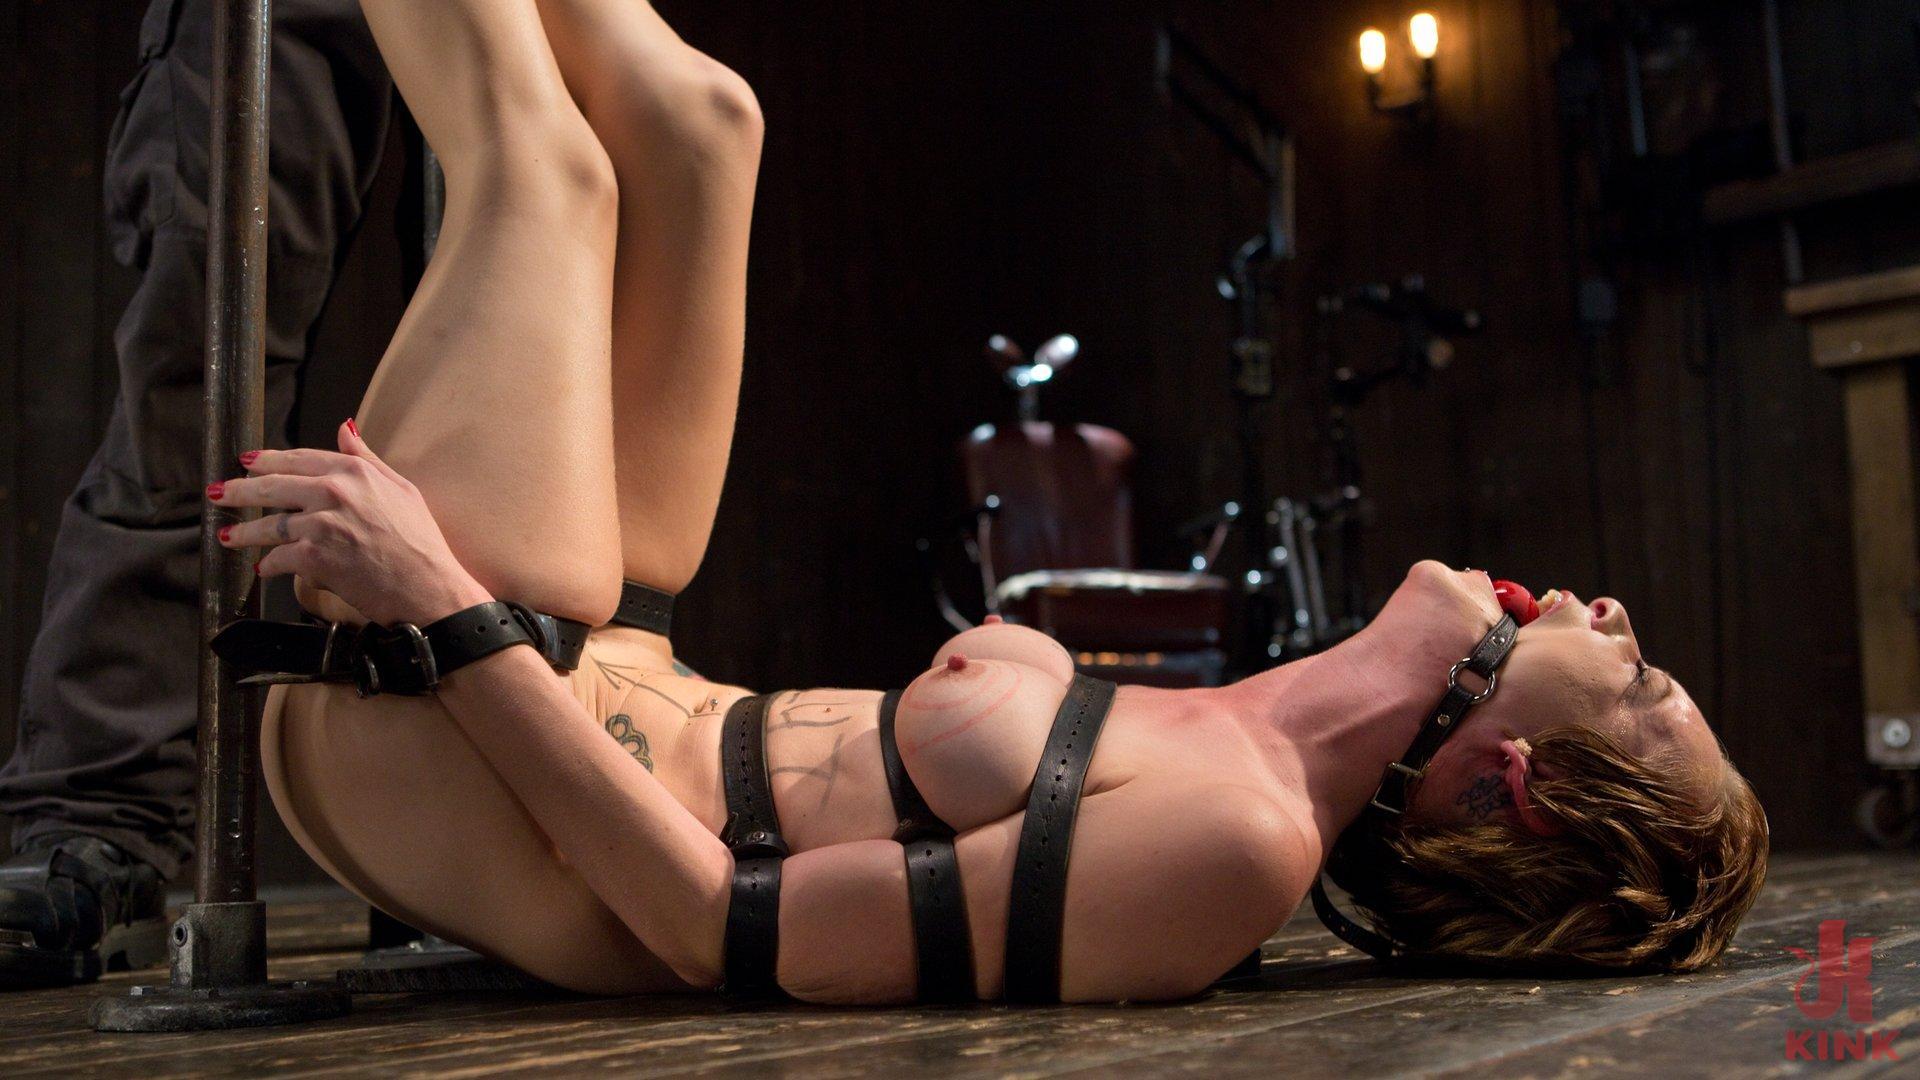 Photo number 7 from Slut Hole shot for Device Bondage on Kink.com. Featuring Jeze Belle in hardcore BDSM & Fetish porn.